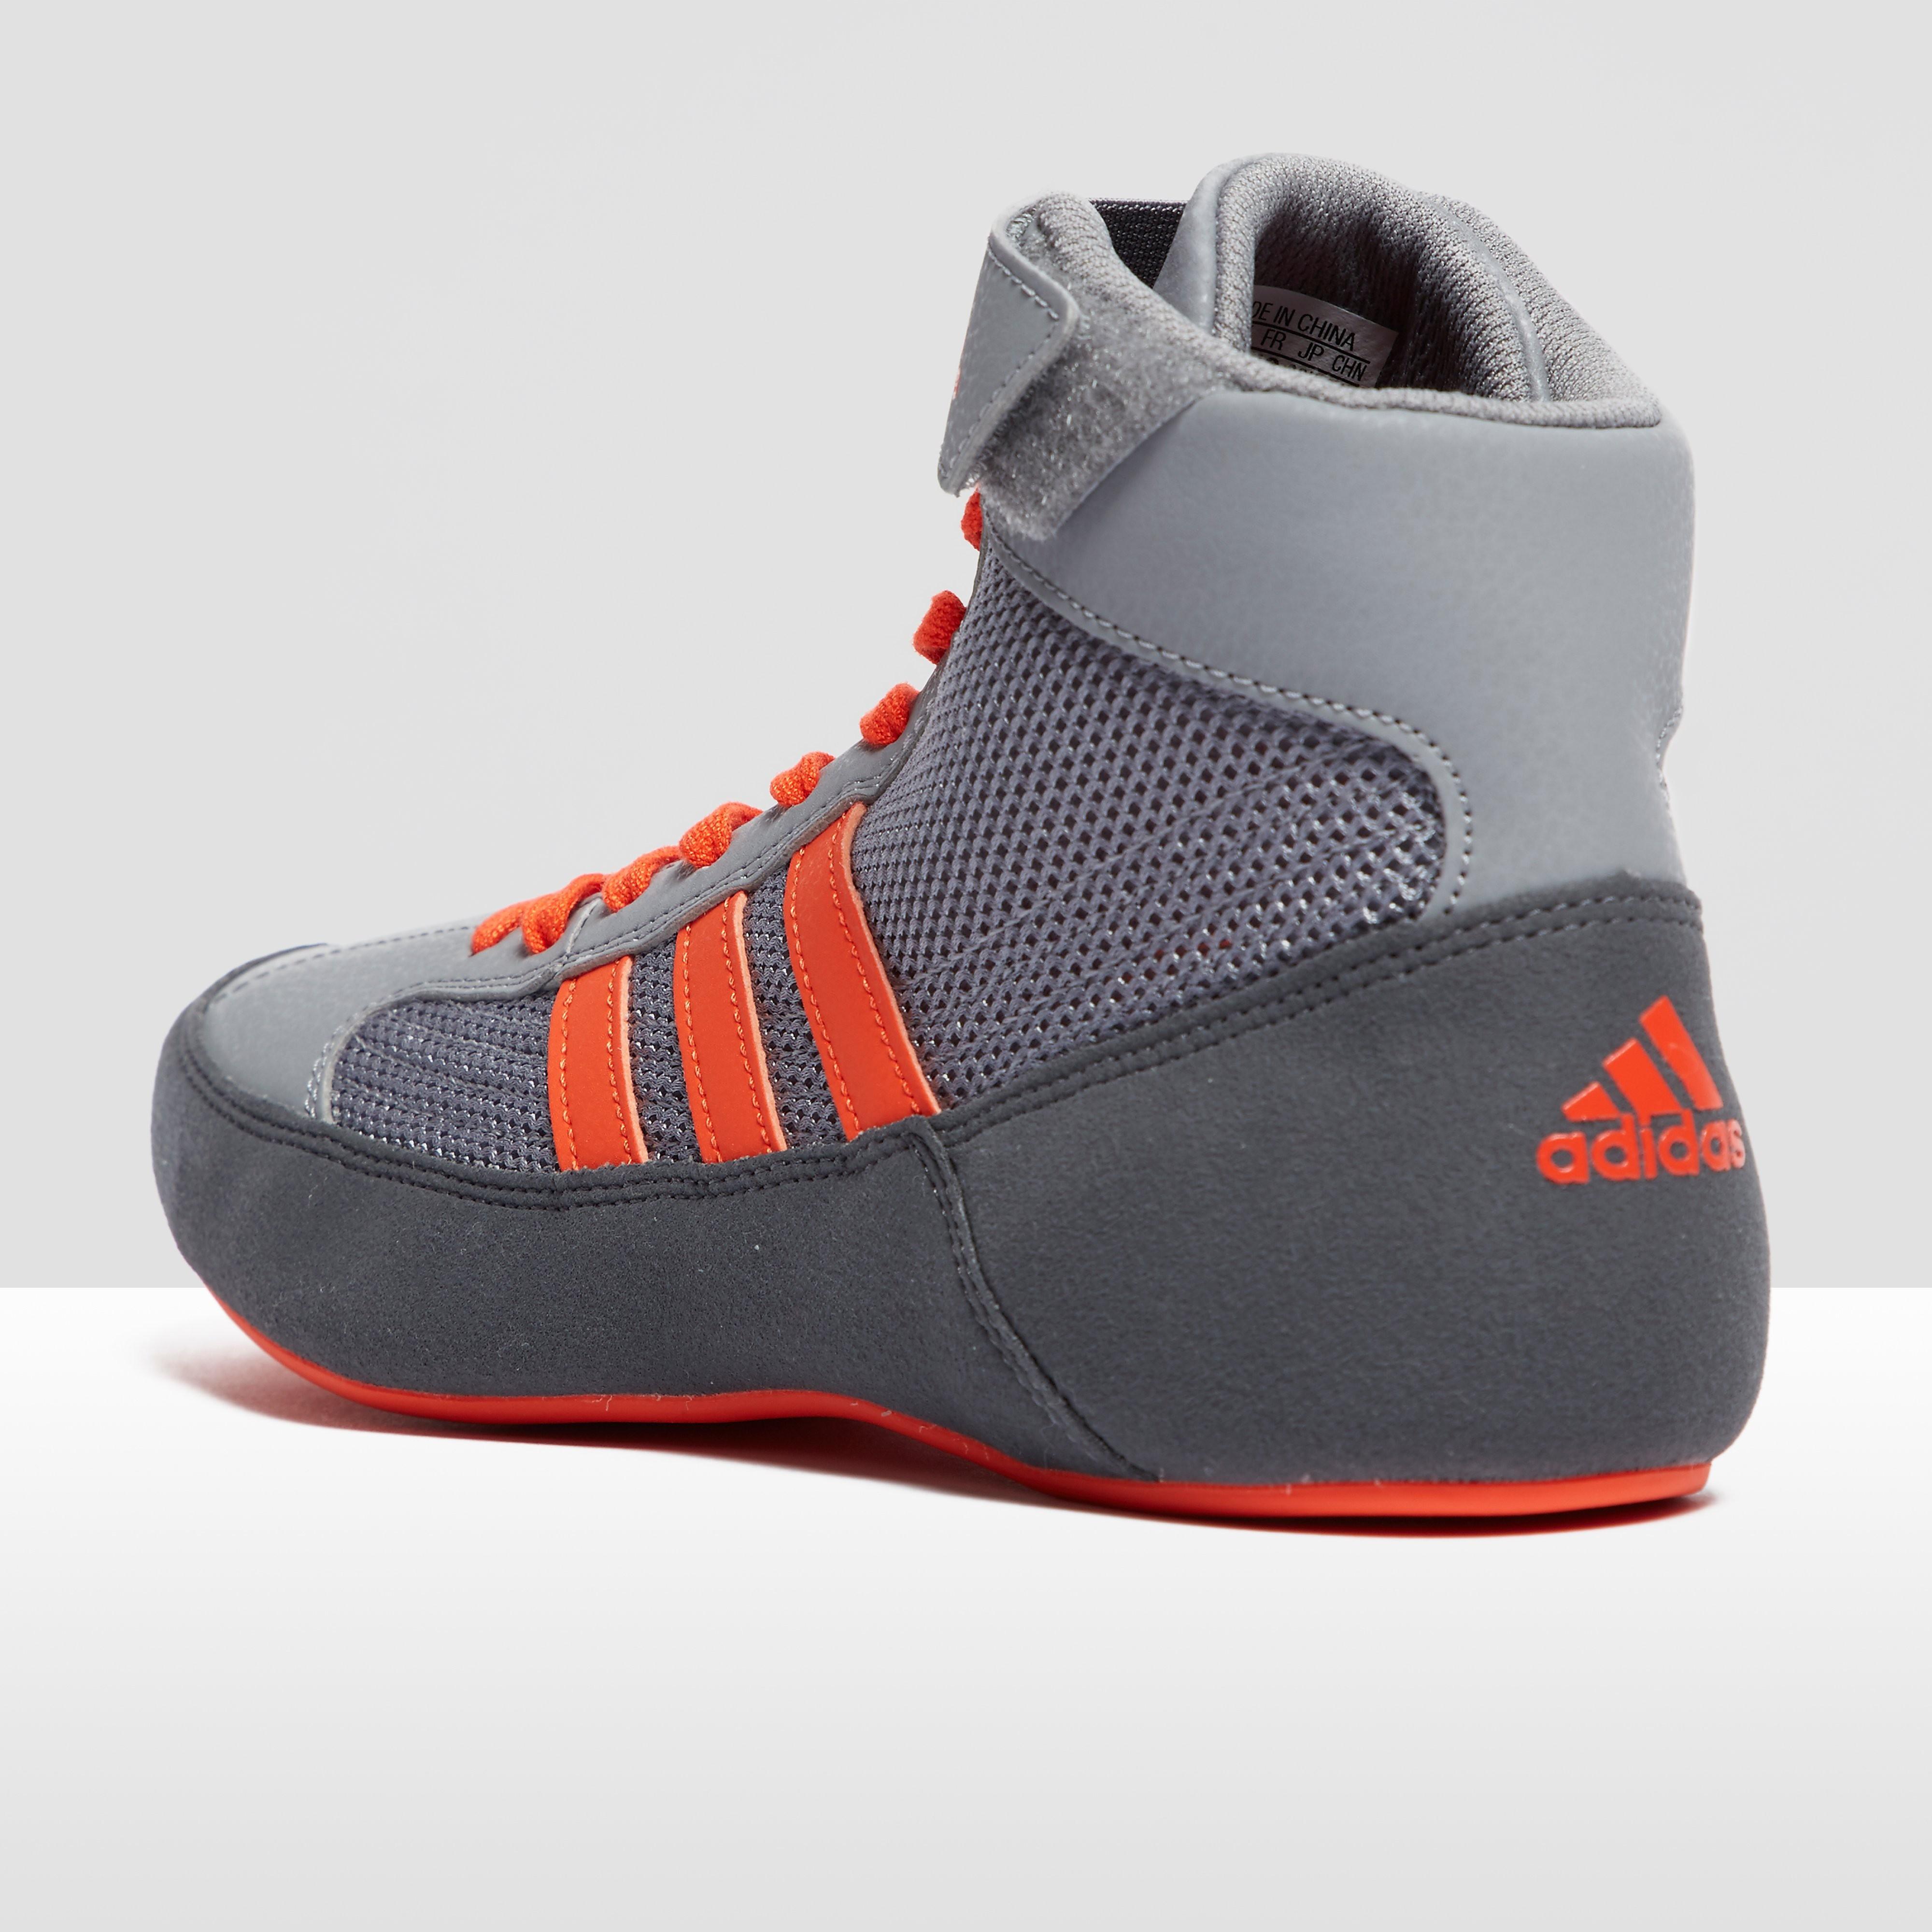 adidas Havoc 2 Men's Wrestling Boots